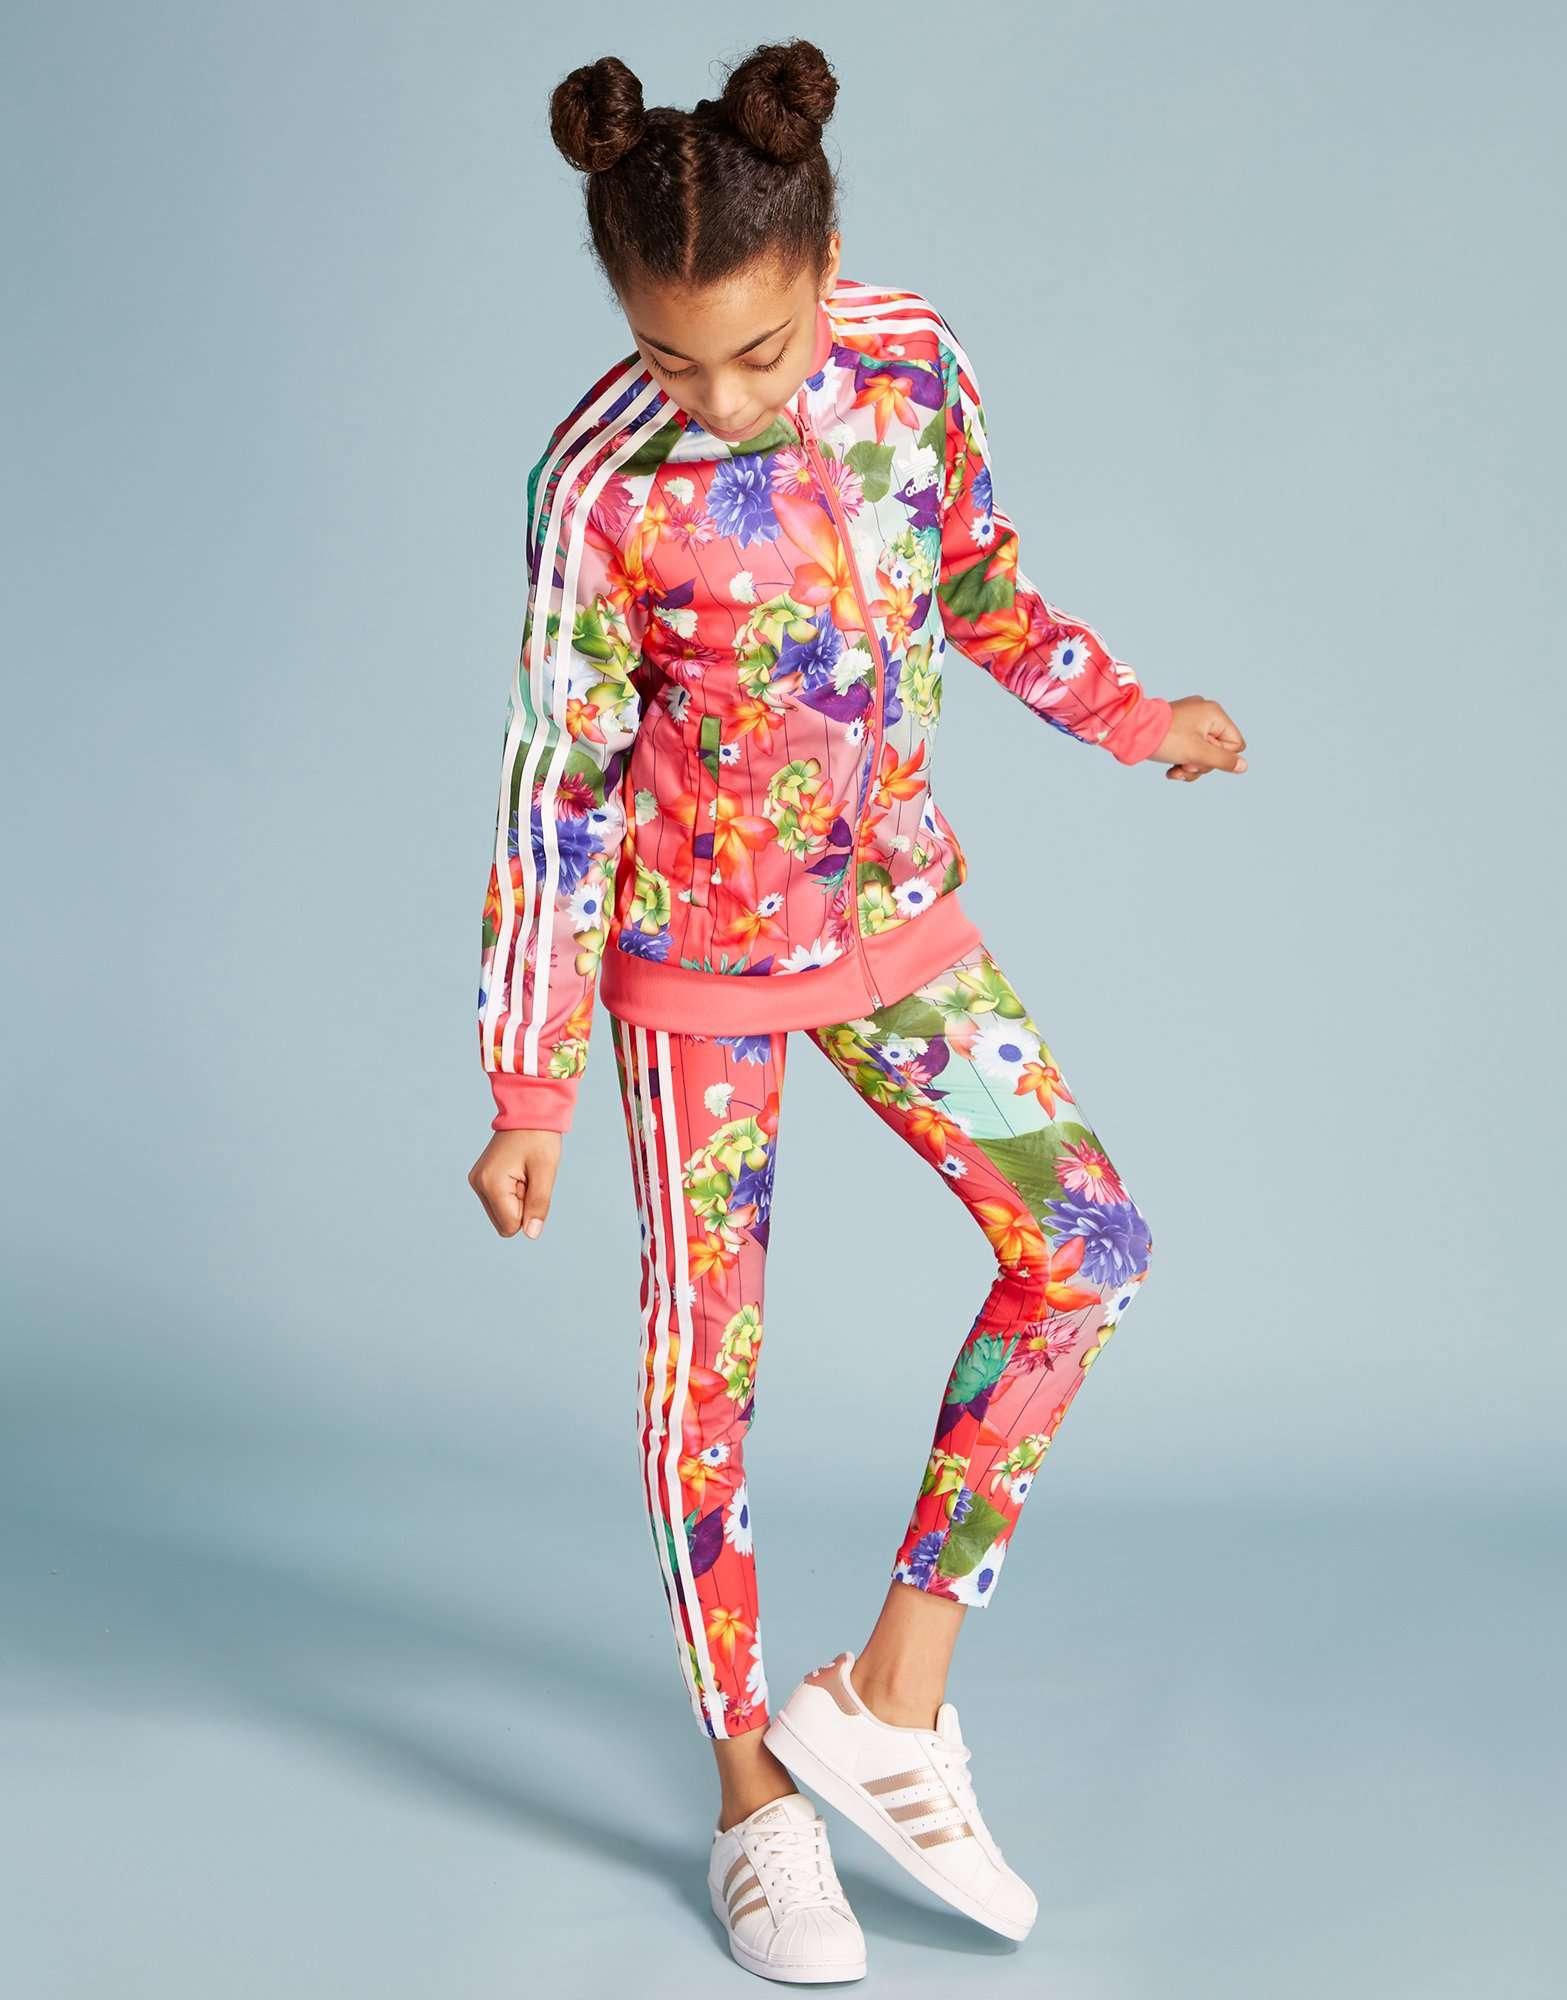 Adidas Originals Girls' floral leggings Junior JD Sports